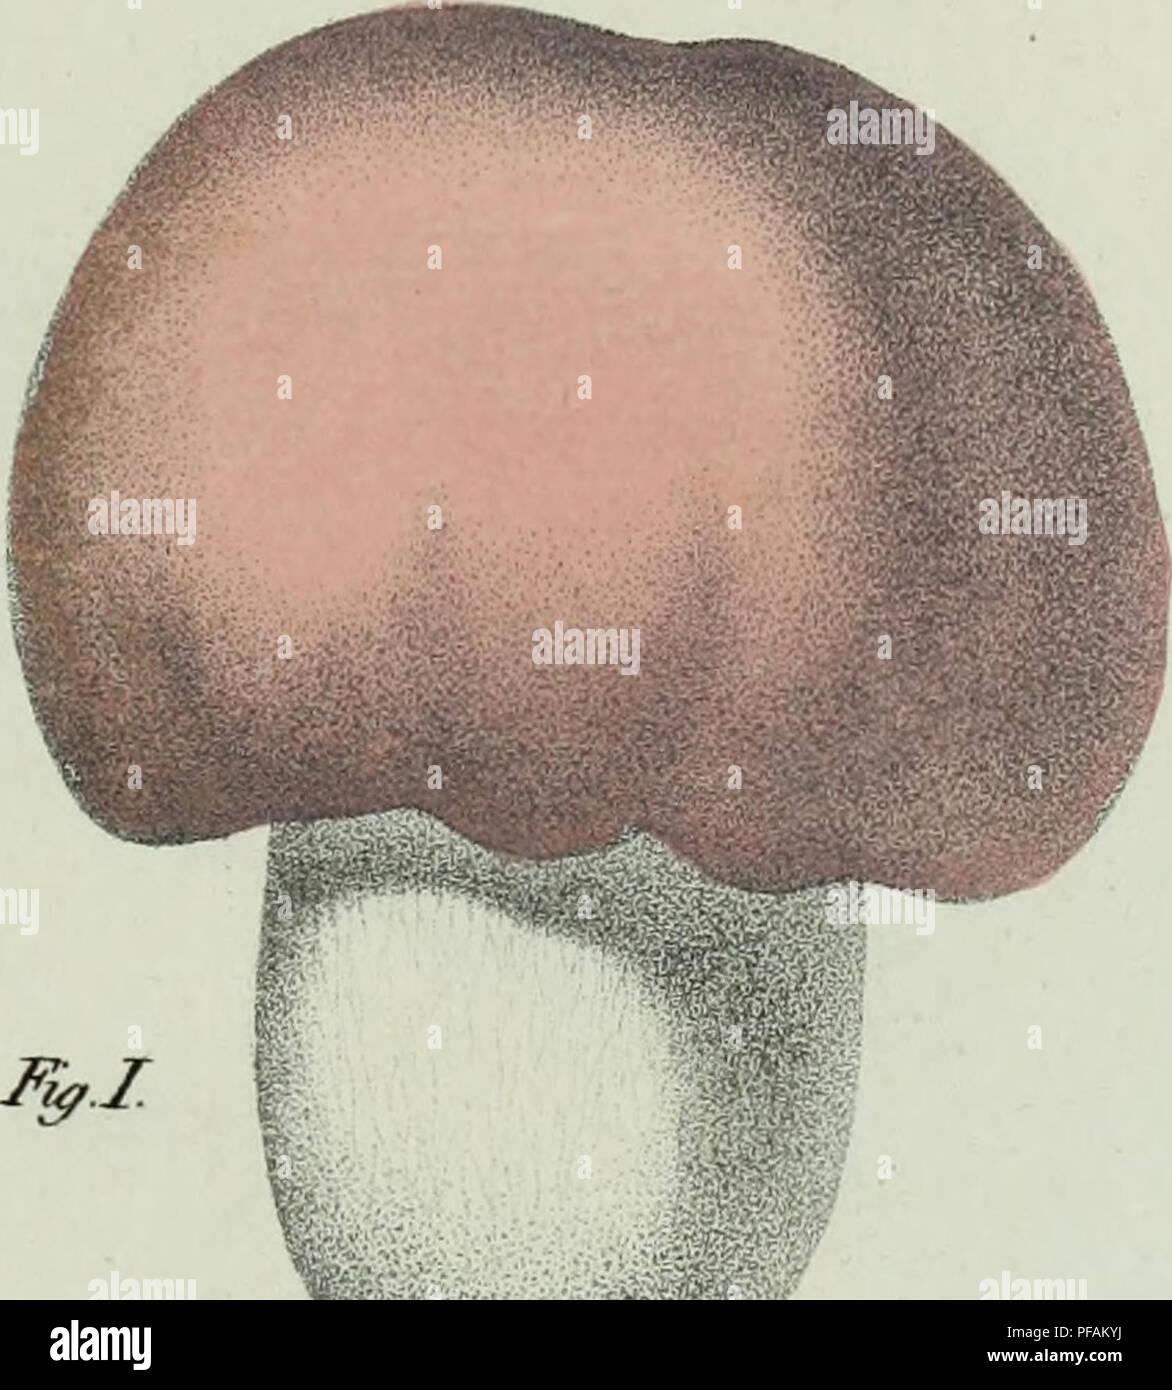 . Descrizione dei funghi mangerecci più comuni dell'Italia e de' velenosi che possono co' medesimi confondersi. Fungi; Mushrooms. IfyJl. â â ,-Â«*»»*. f^i/trifAni t,r natura In / + 6> f ^/// pt c/a/ (zcu fa/e//*/1S/1. Please note that these images are extracted from scanned page images that may have been digitally enhanced for readability - coloration and appearance of these illustrations may not perfectly resemble the original work.. Vittadini, Carlo; Cavagna Sangiuliani di Gualdana, Antonio, conte, 1843-1913, former owner. IU-R. Milano, Rusconi - Stock Image